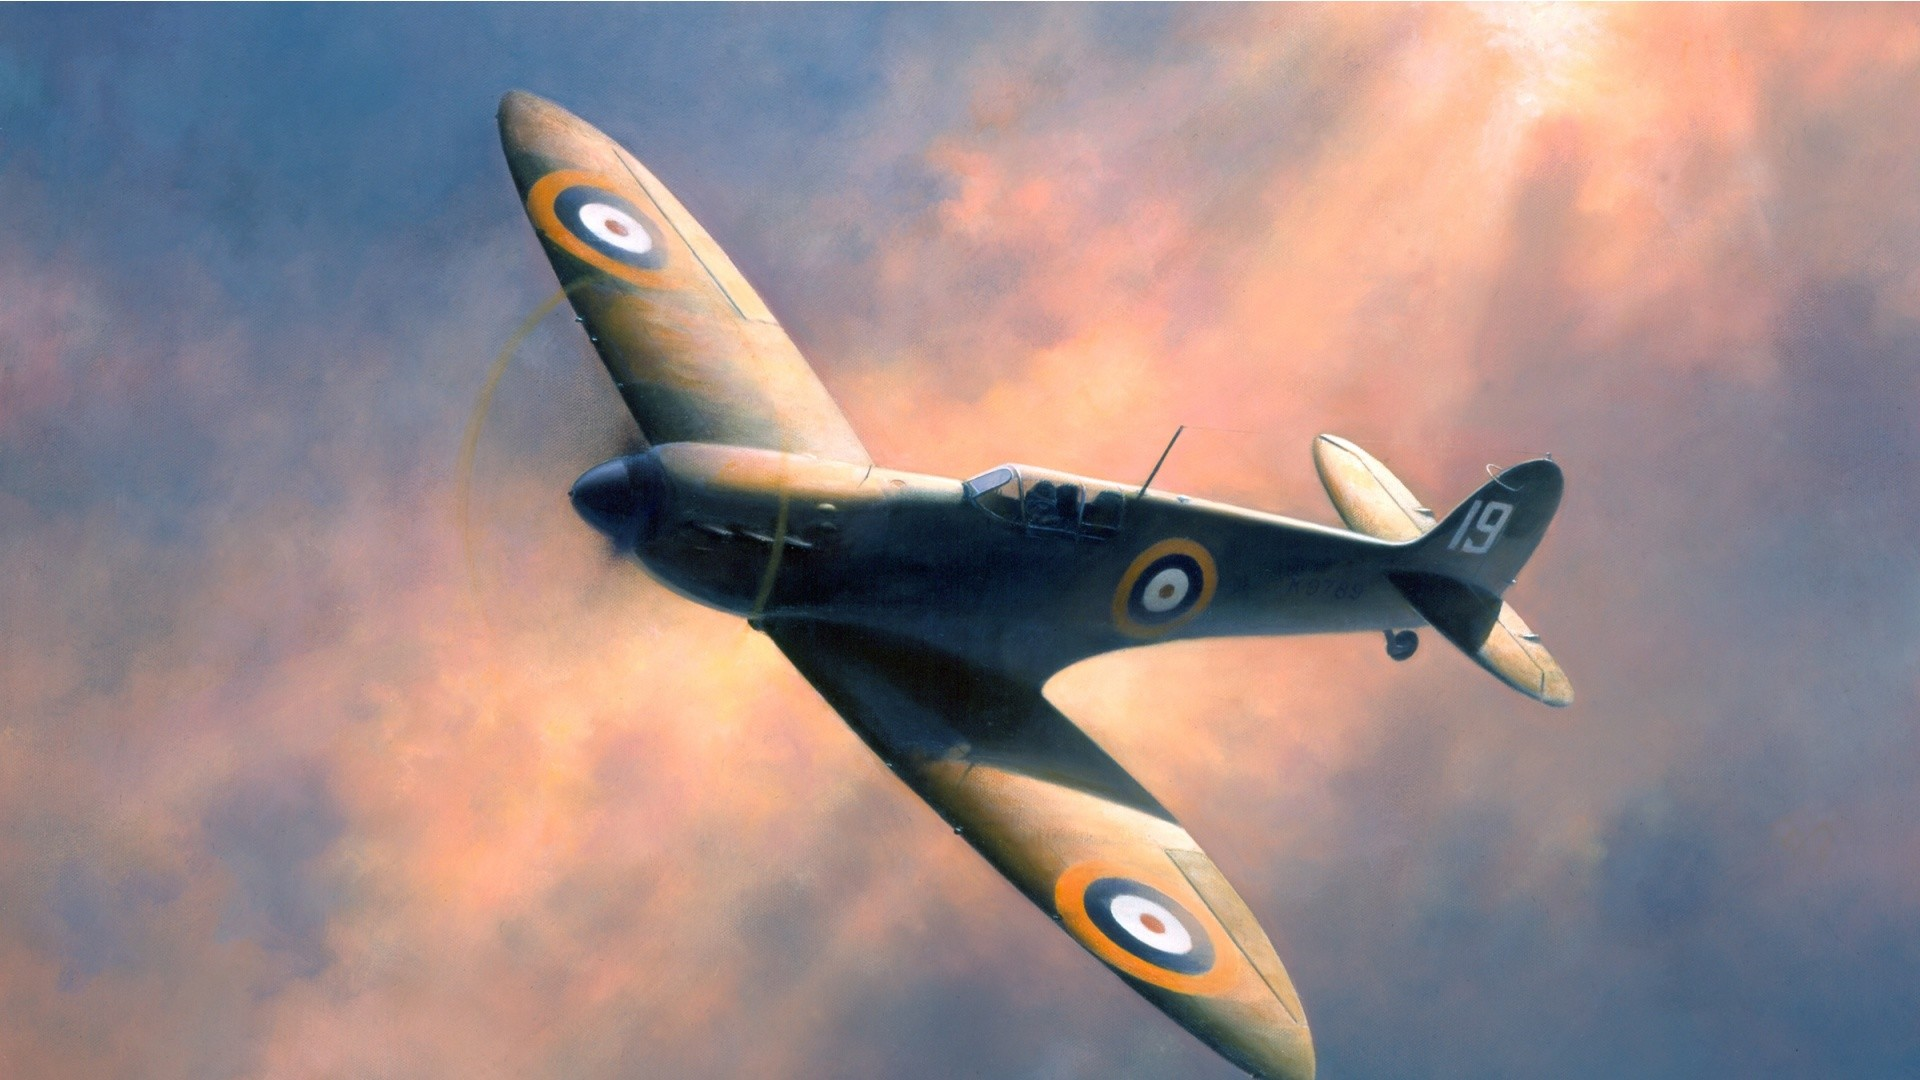 1920x1080 HD English fighter - Supermarine Spitfire wallpaper | English fighter – Supermarine Spitfire wallpapers hd | Pinterest | Supermarine spitfire, ...